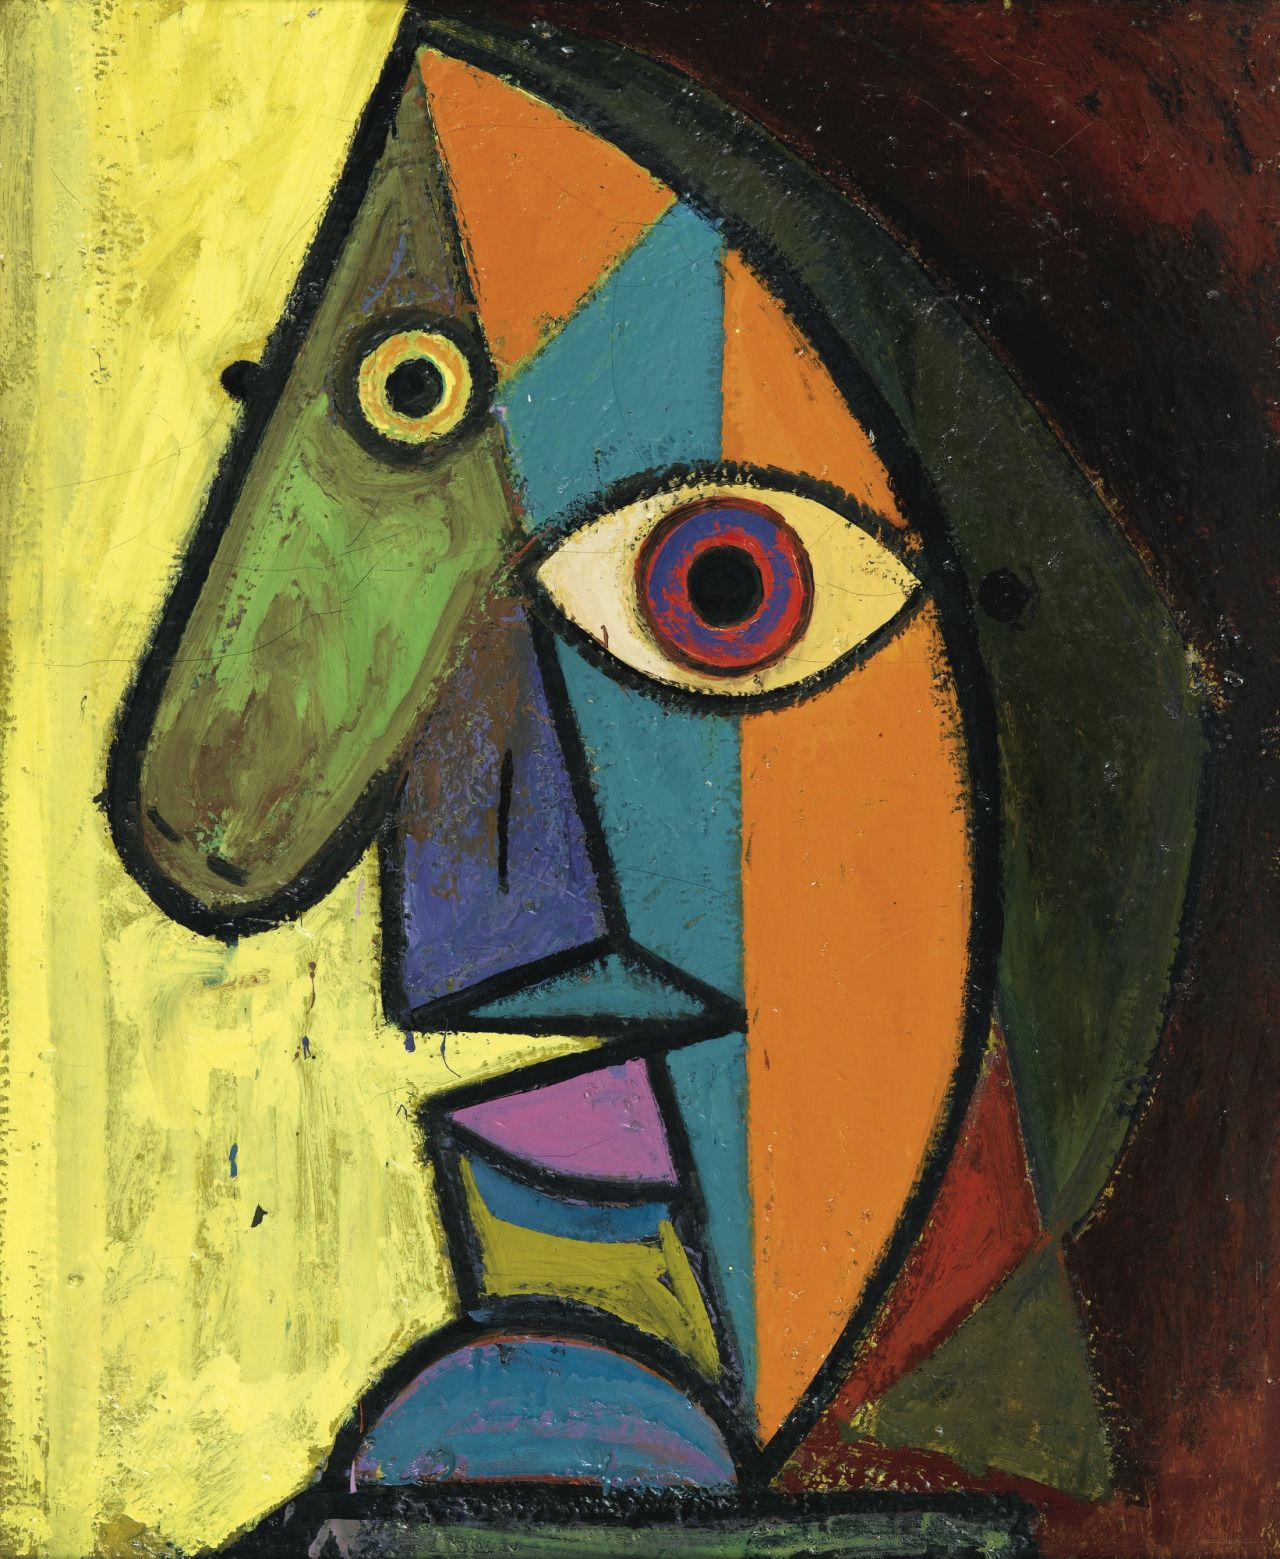 Pablo Picasso 1938 Dora Maar